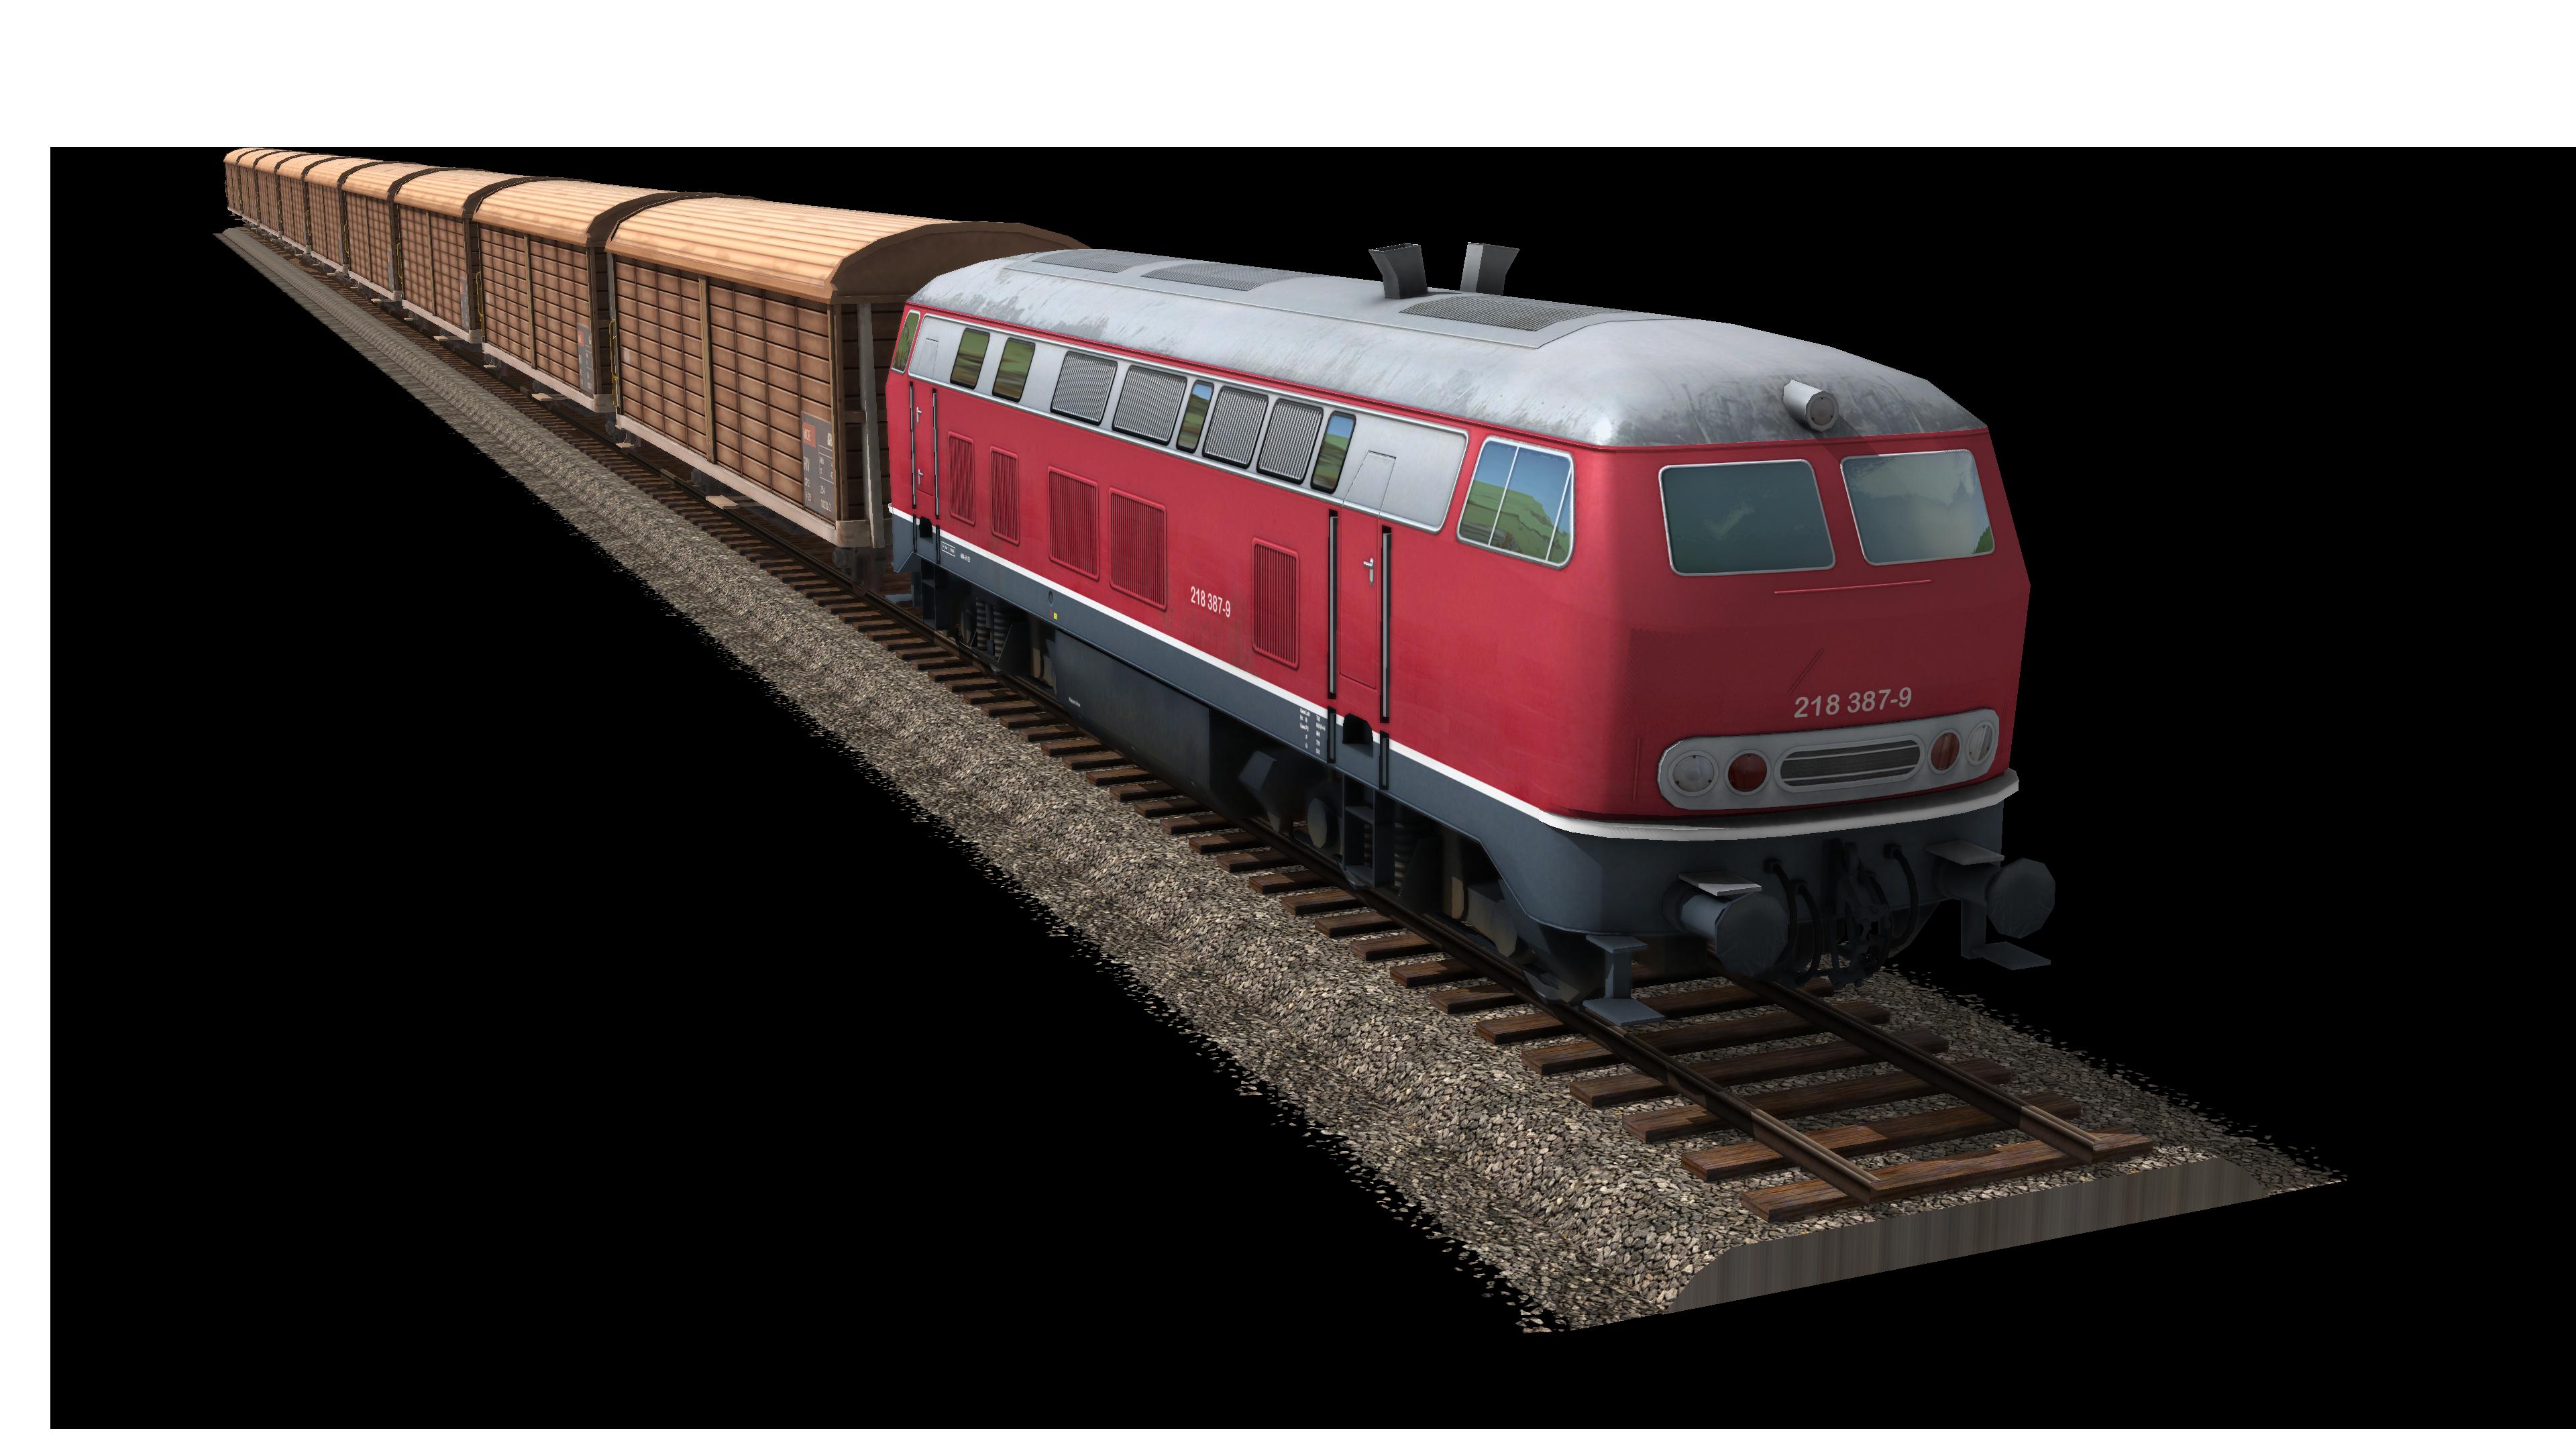 Rail transport desktop wallpaper. Clipart train freight train